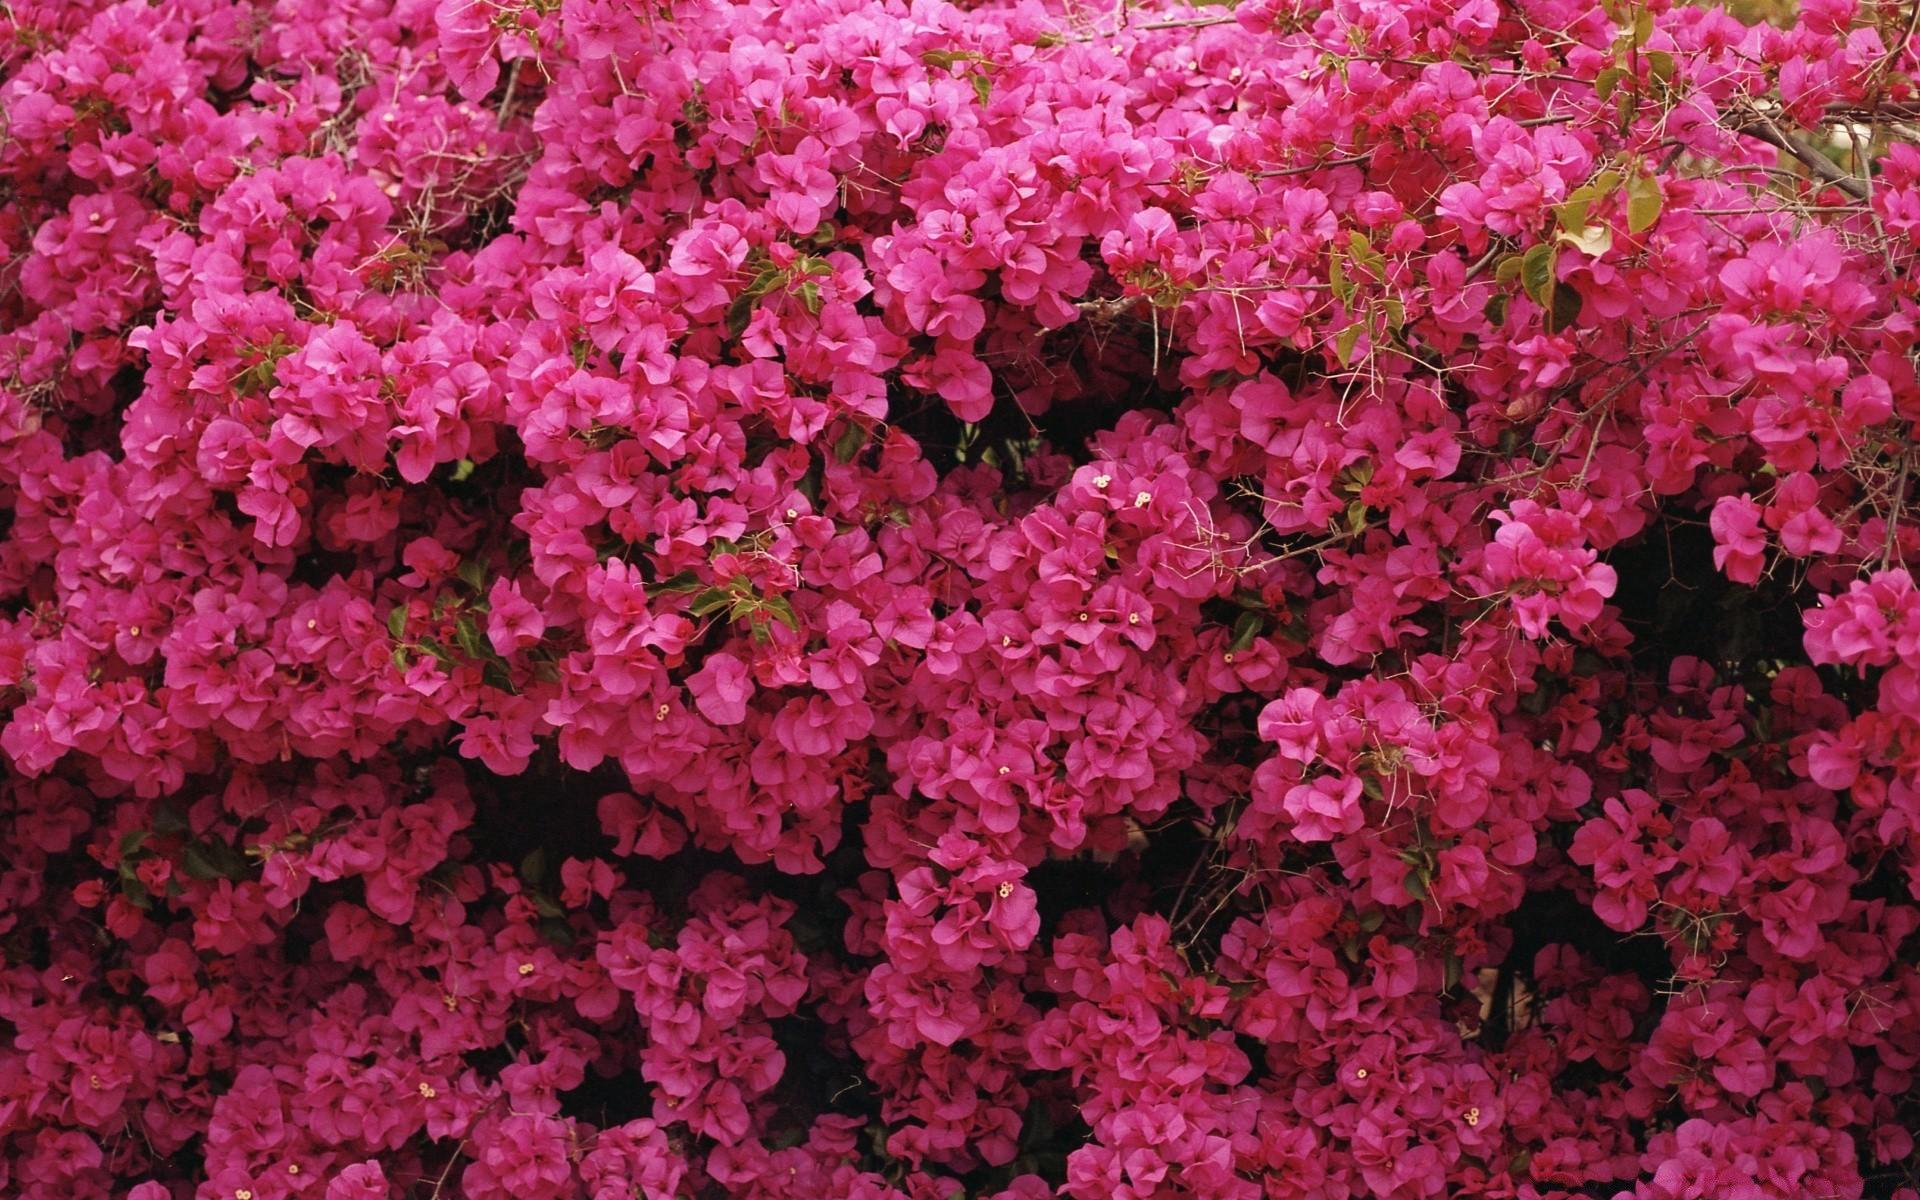 куст розовые цветы фото вячеслава константиновского